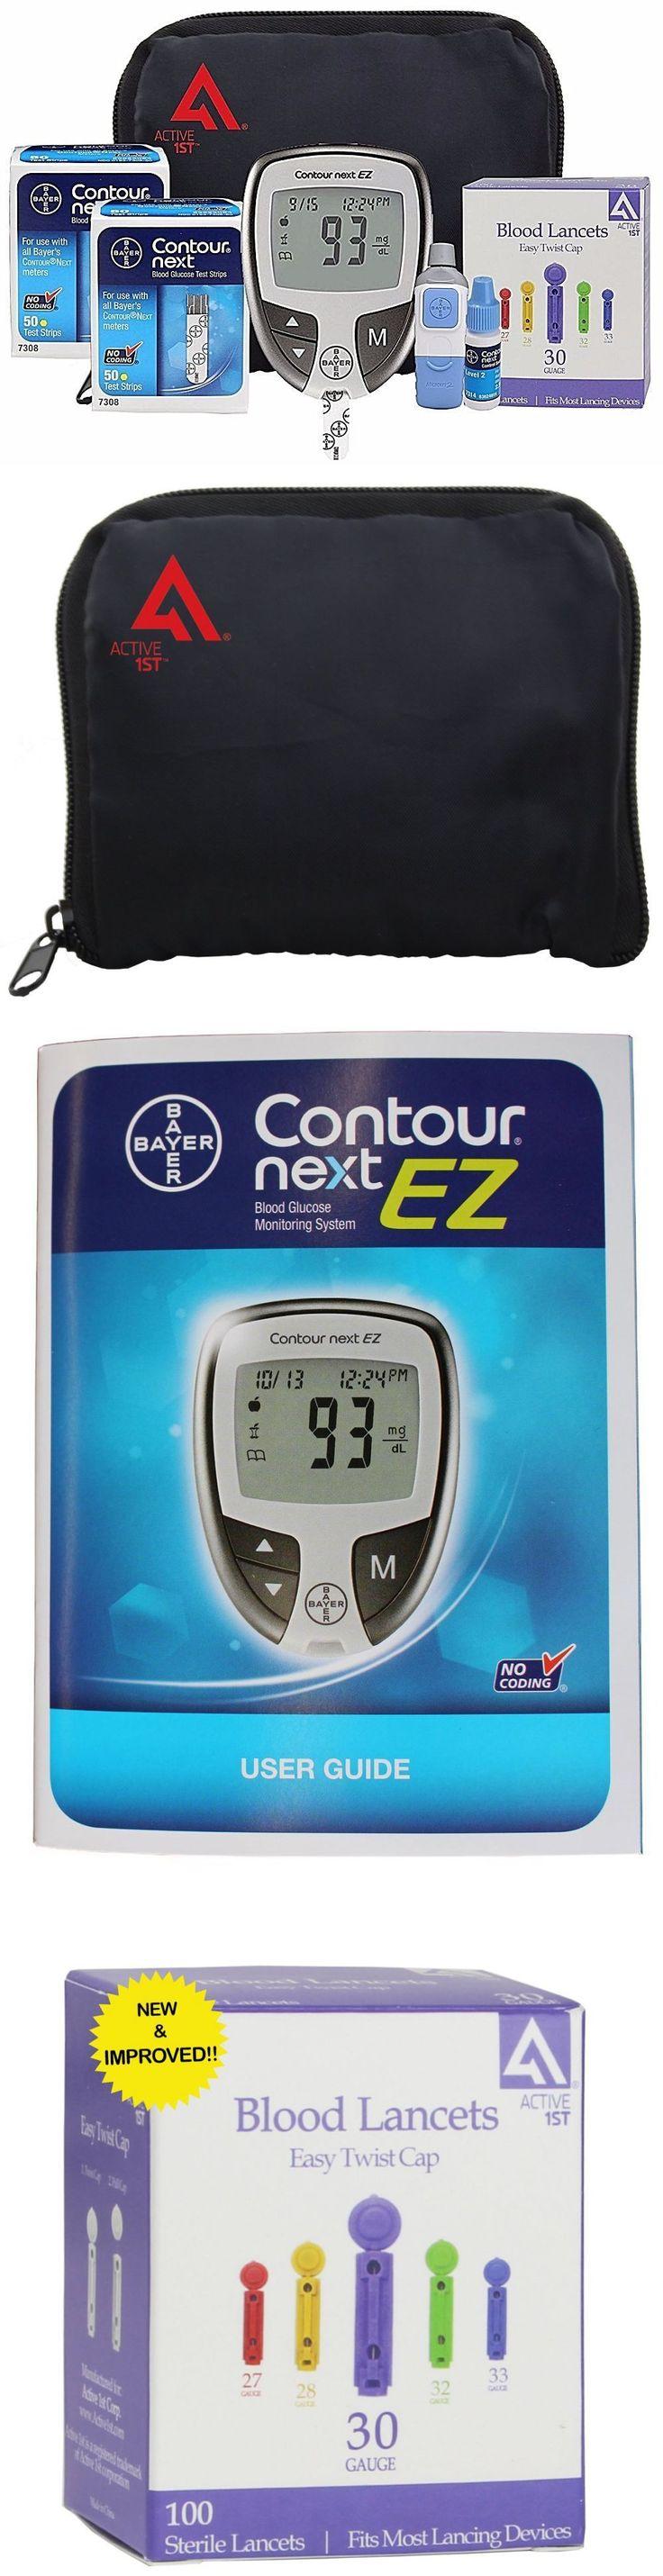 Monitoring Kits: Diabetes Testing Kit 100 Test Strips 100 Lancets Lancing Device Logbook Manual BUY IT NOW ONLY: $58.97